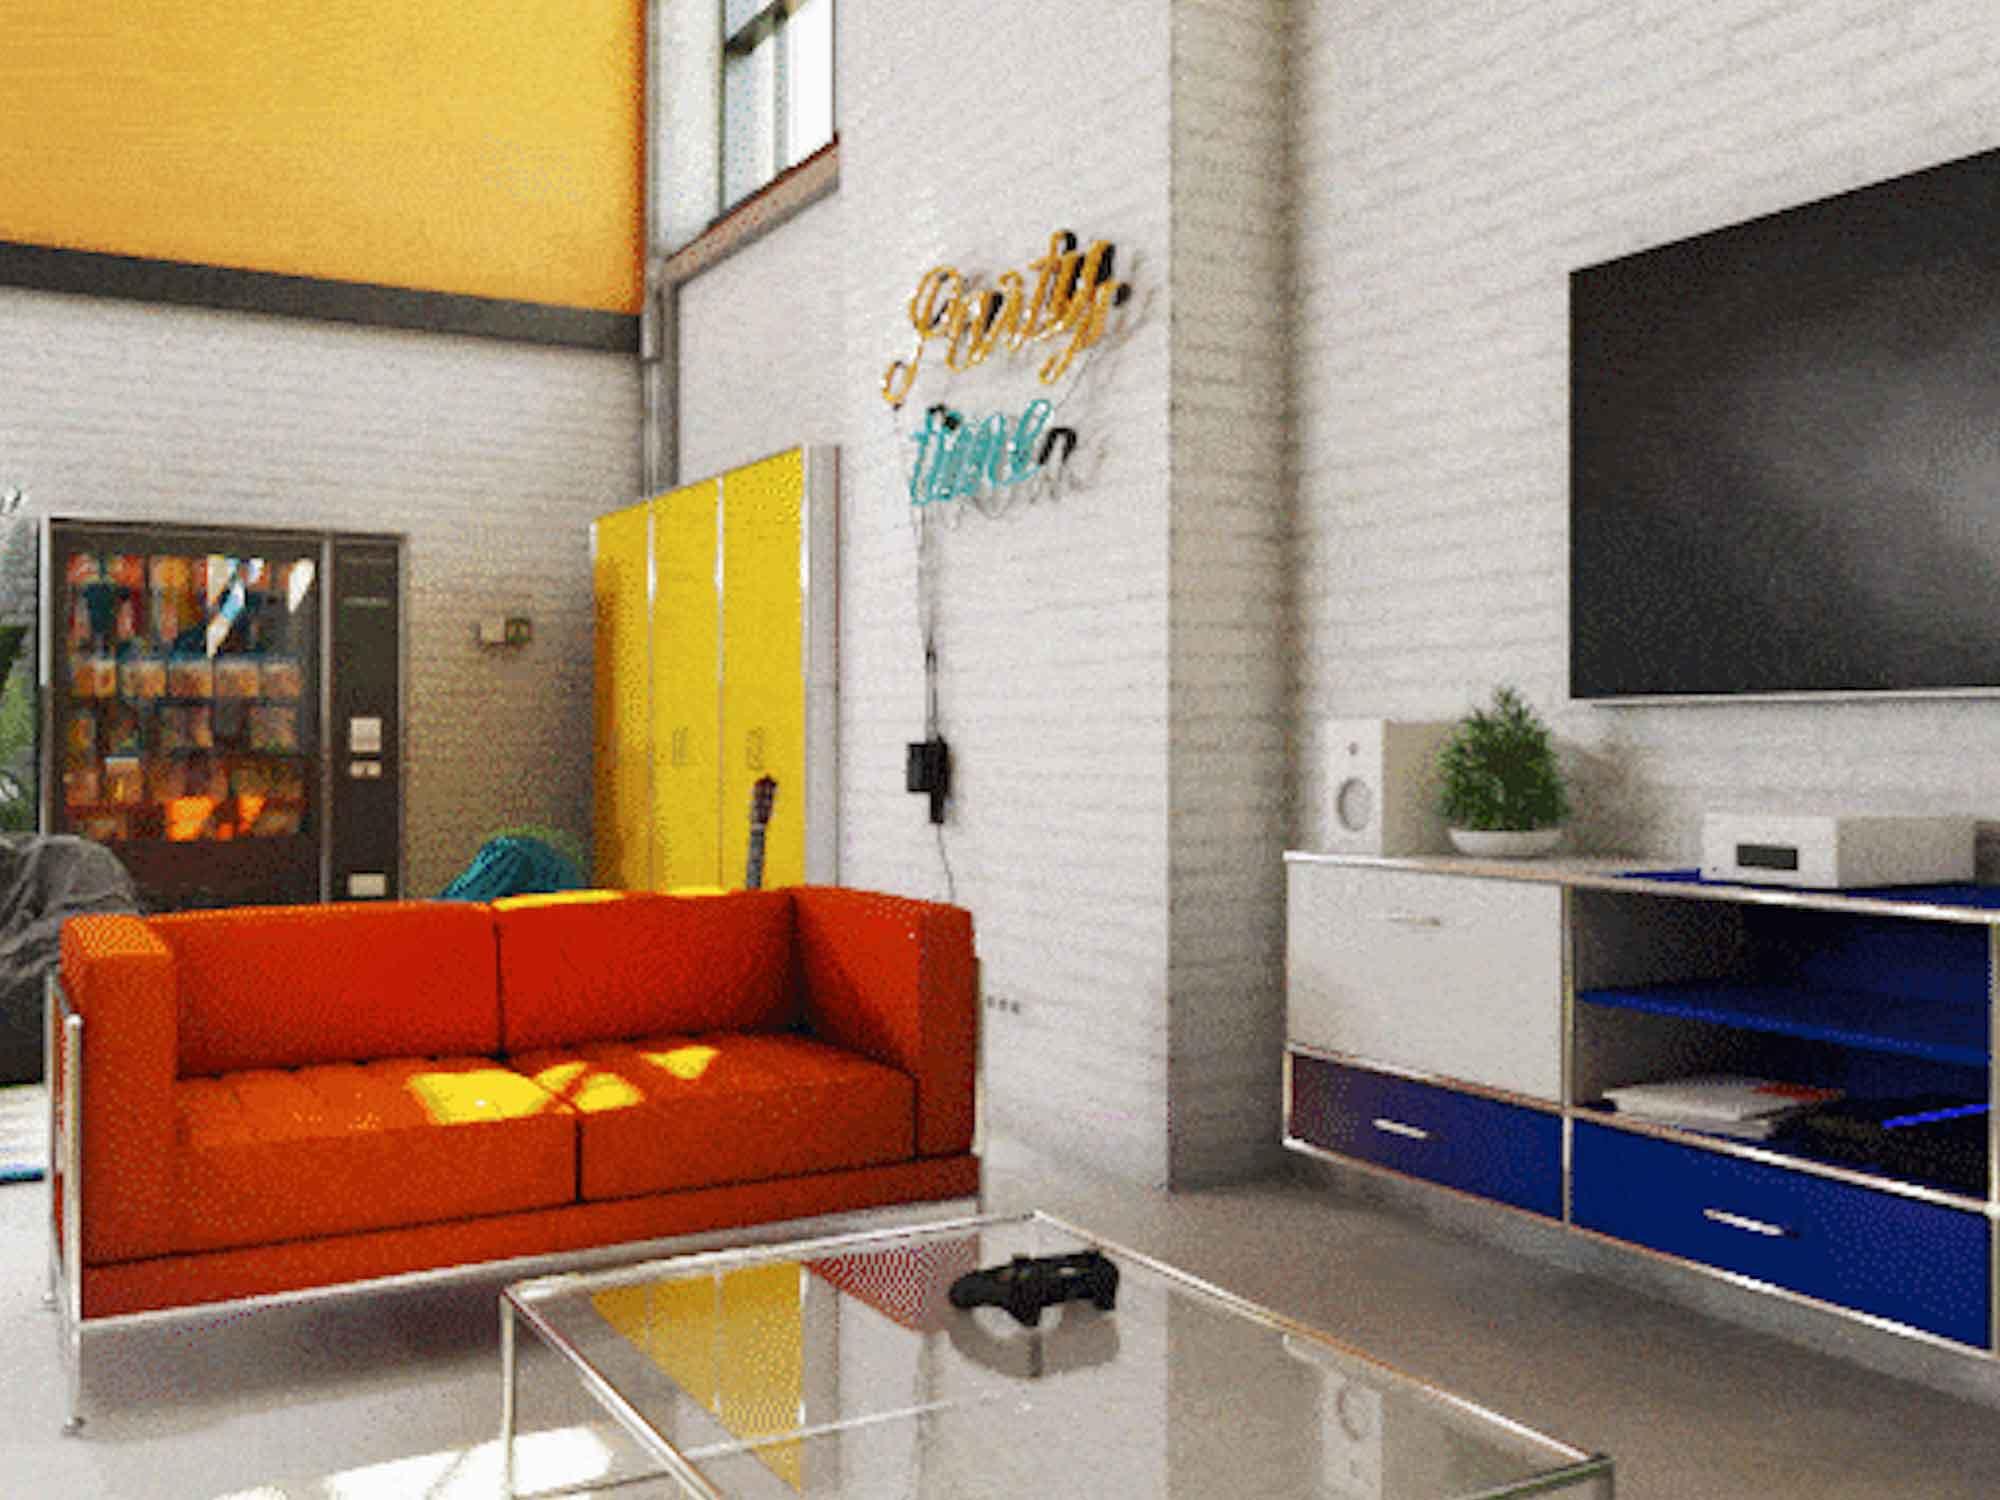 farbenkünstler_sofa_dialounge_blau_orange_teil_7